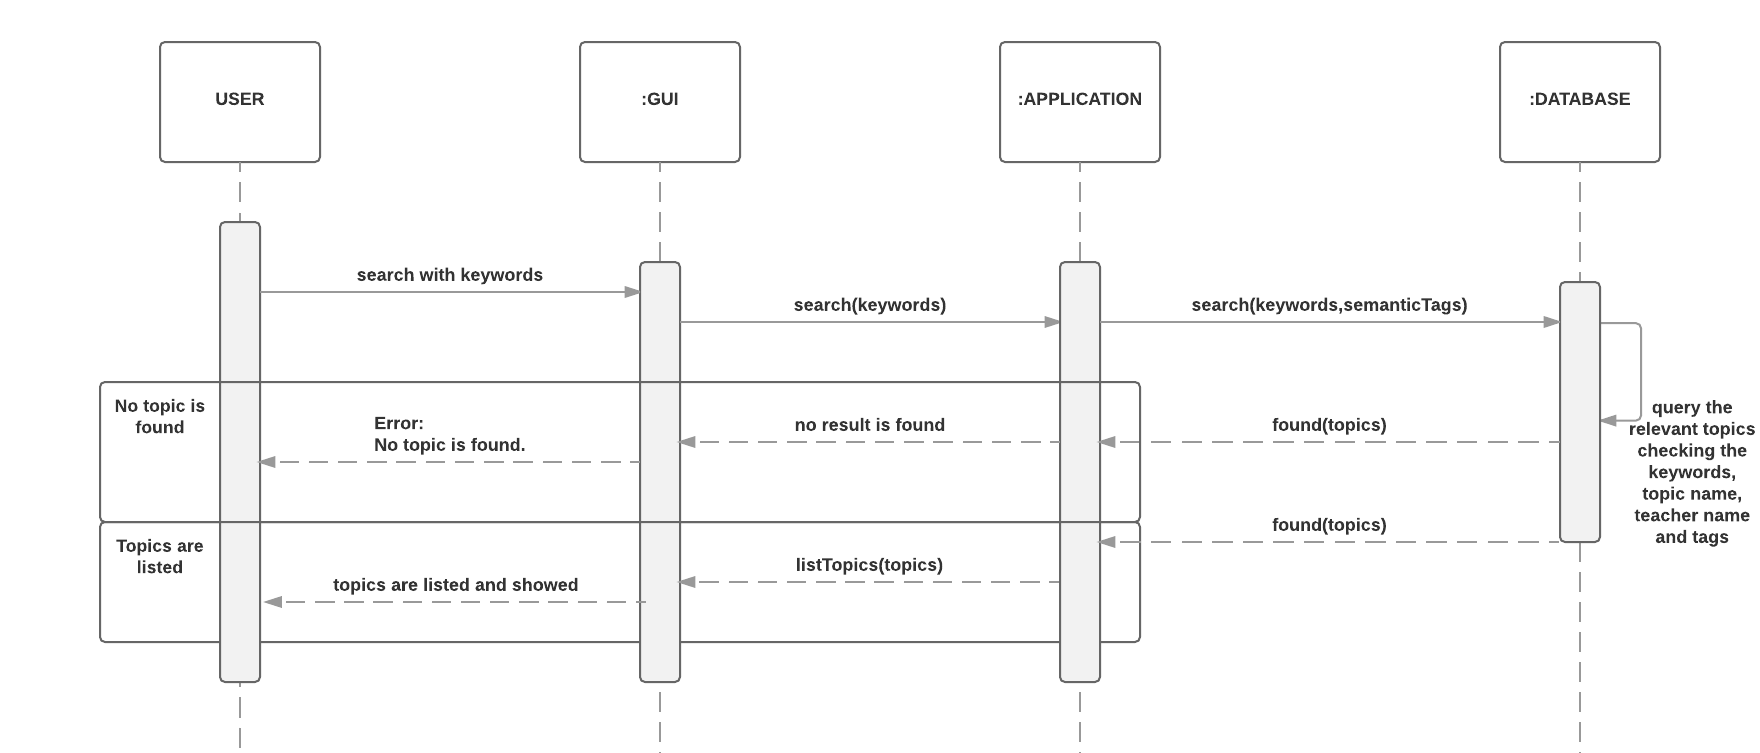 Sequence Diagram middot bounswe bounswe2016group8 Wiki middot GitHub